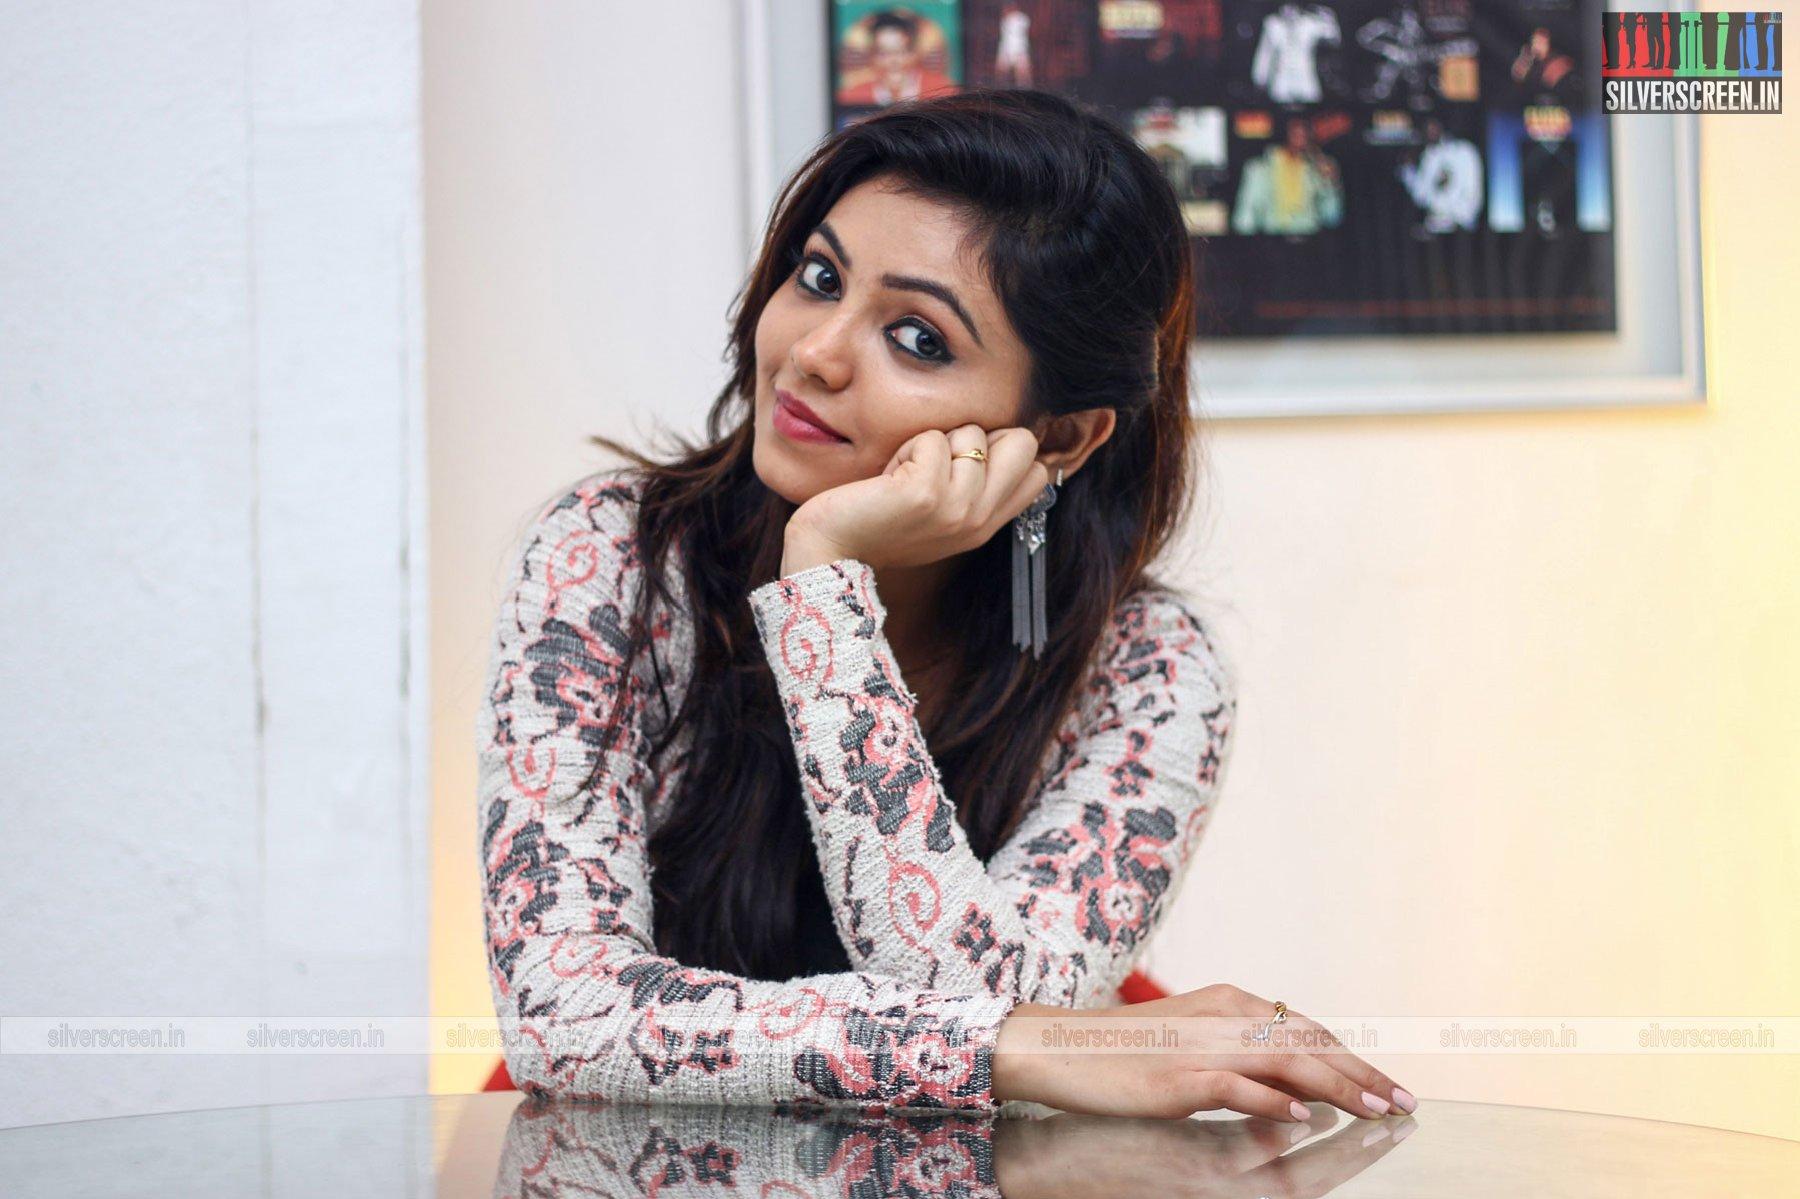 The News Review >> Yemaai Movie Stills Starring Sam Jones, Athulya Ravi And Others | Silverscreen.in